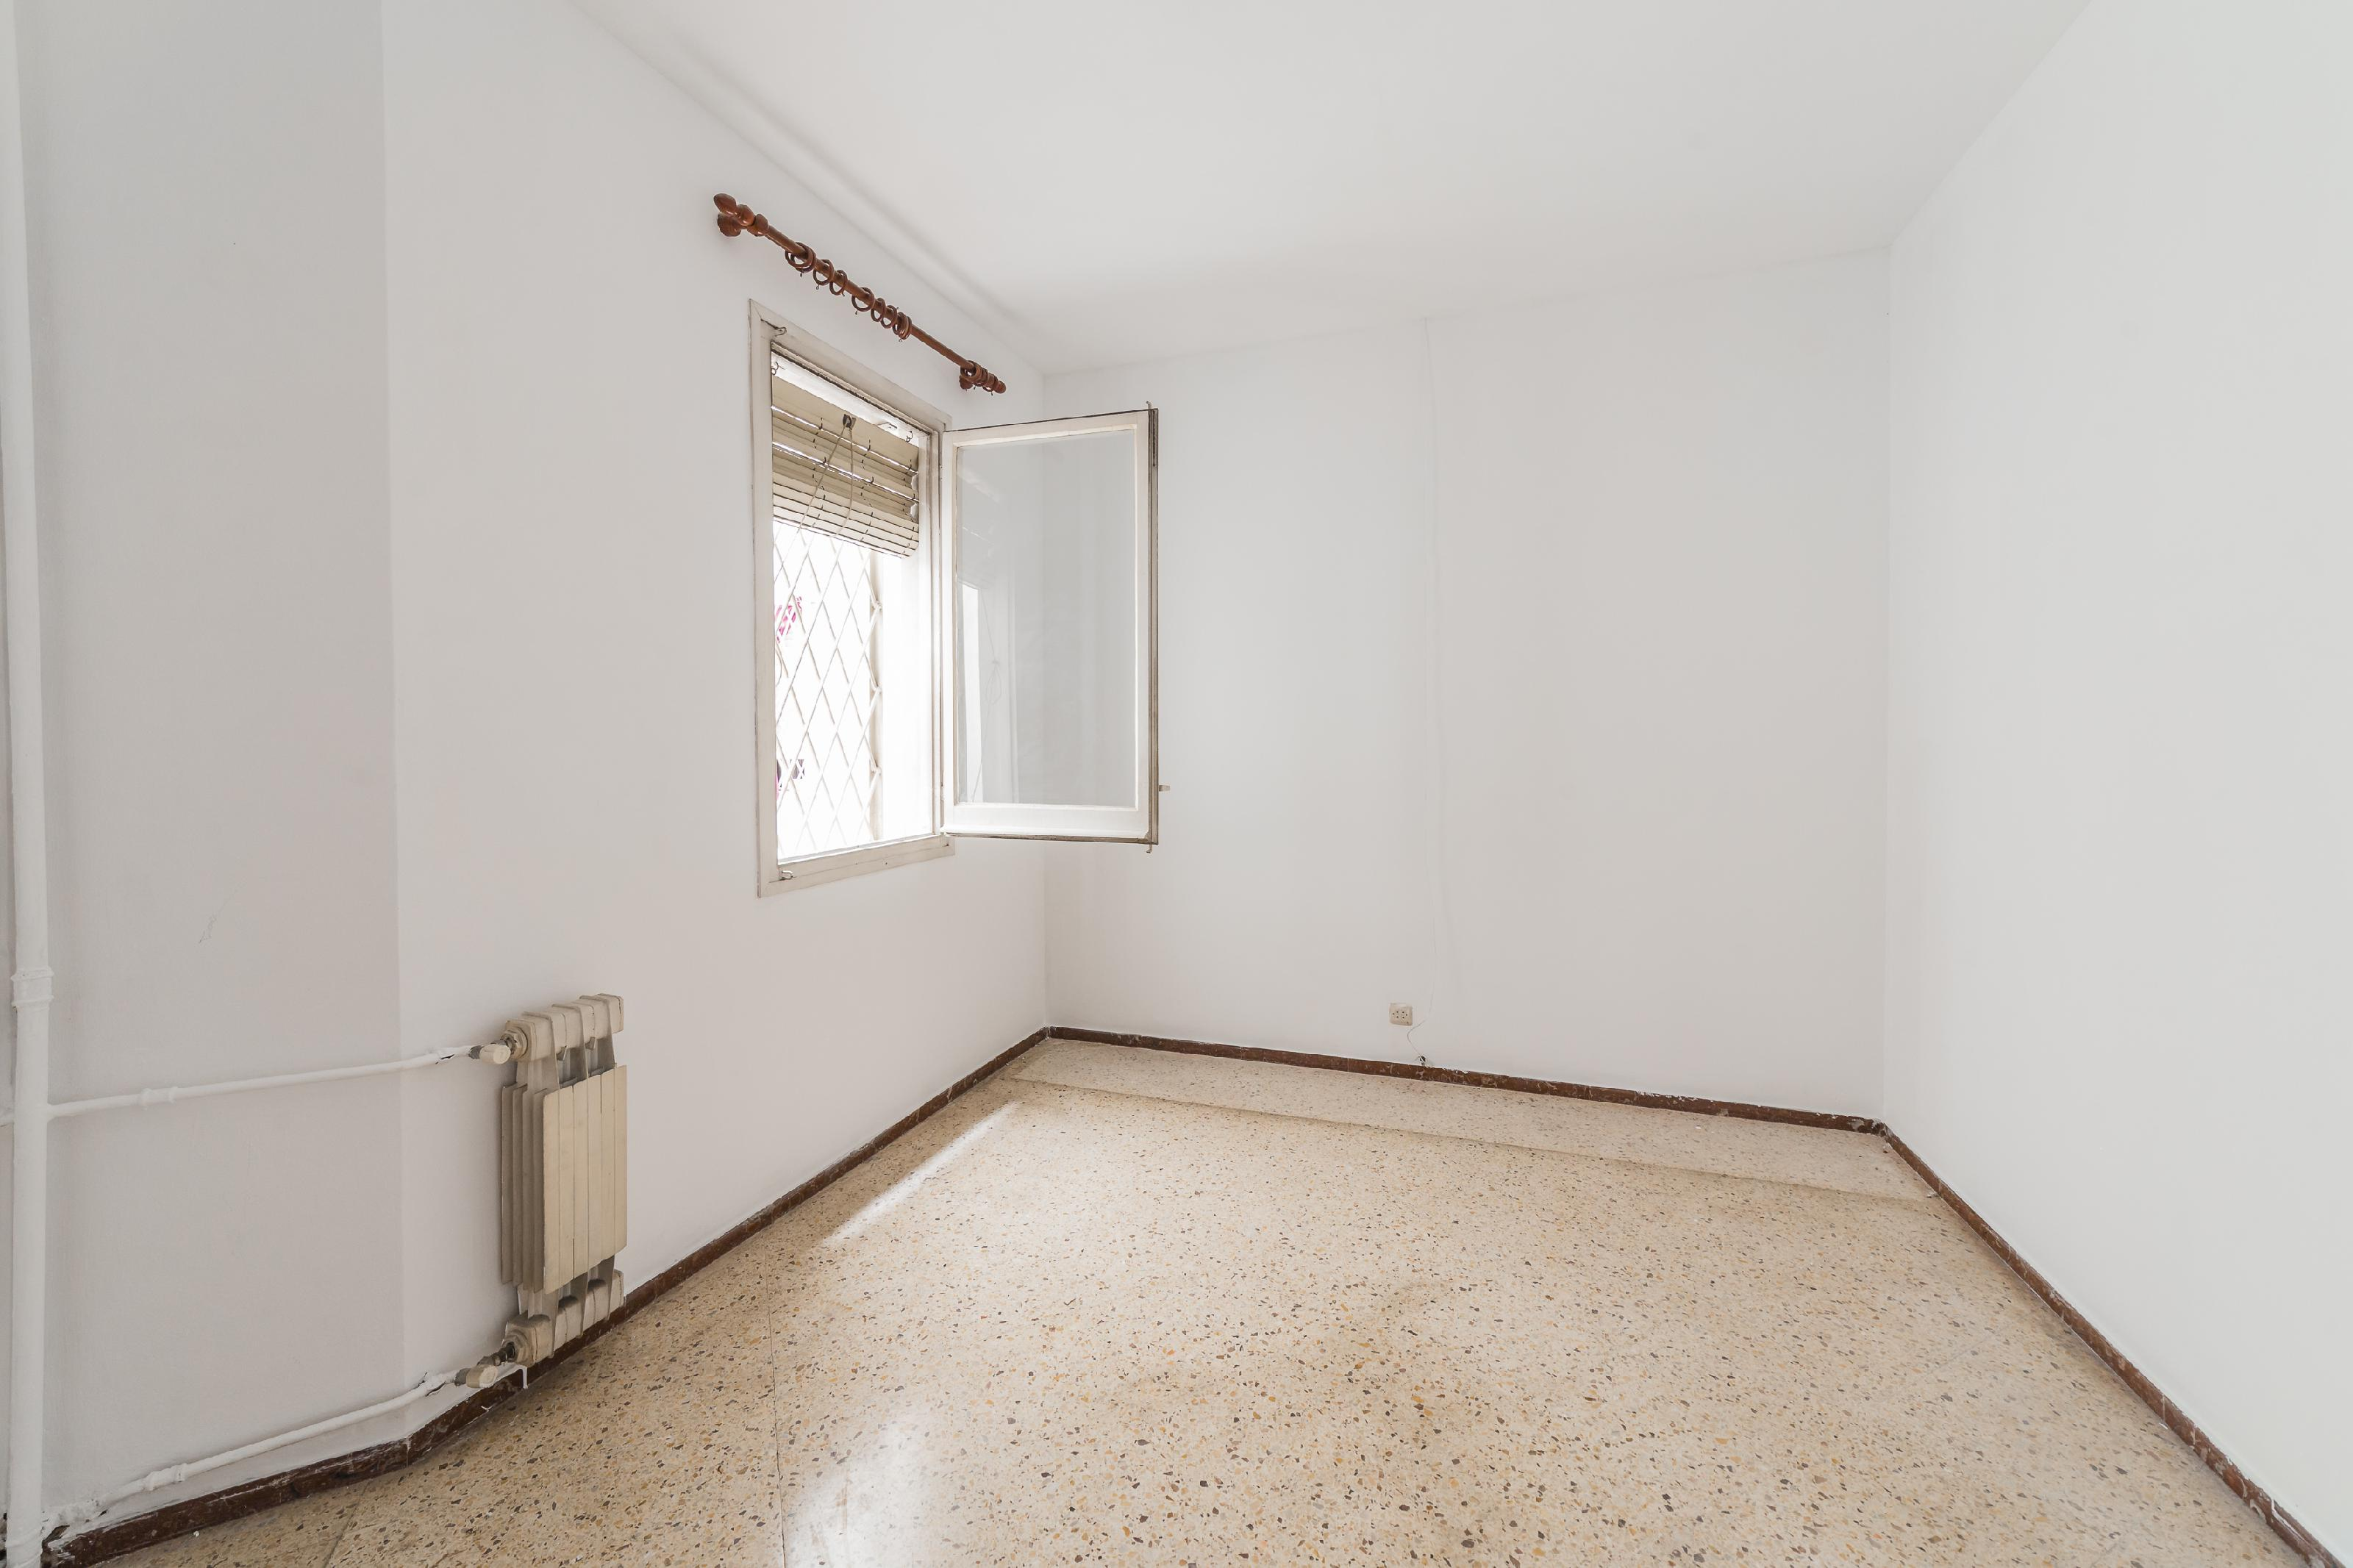 247624 Flat for sale in Eixample, Sant Antoni 18